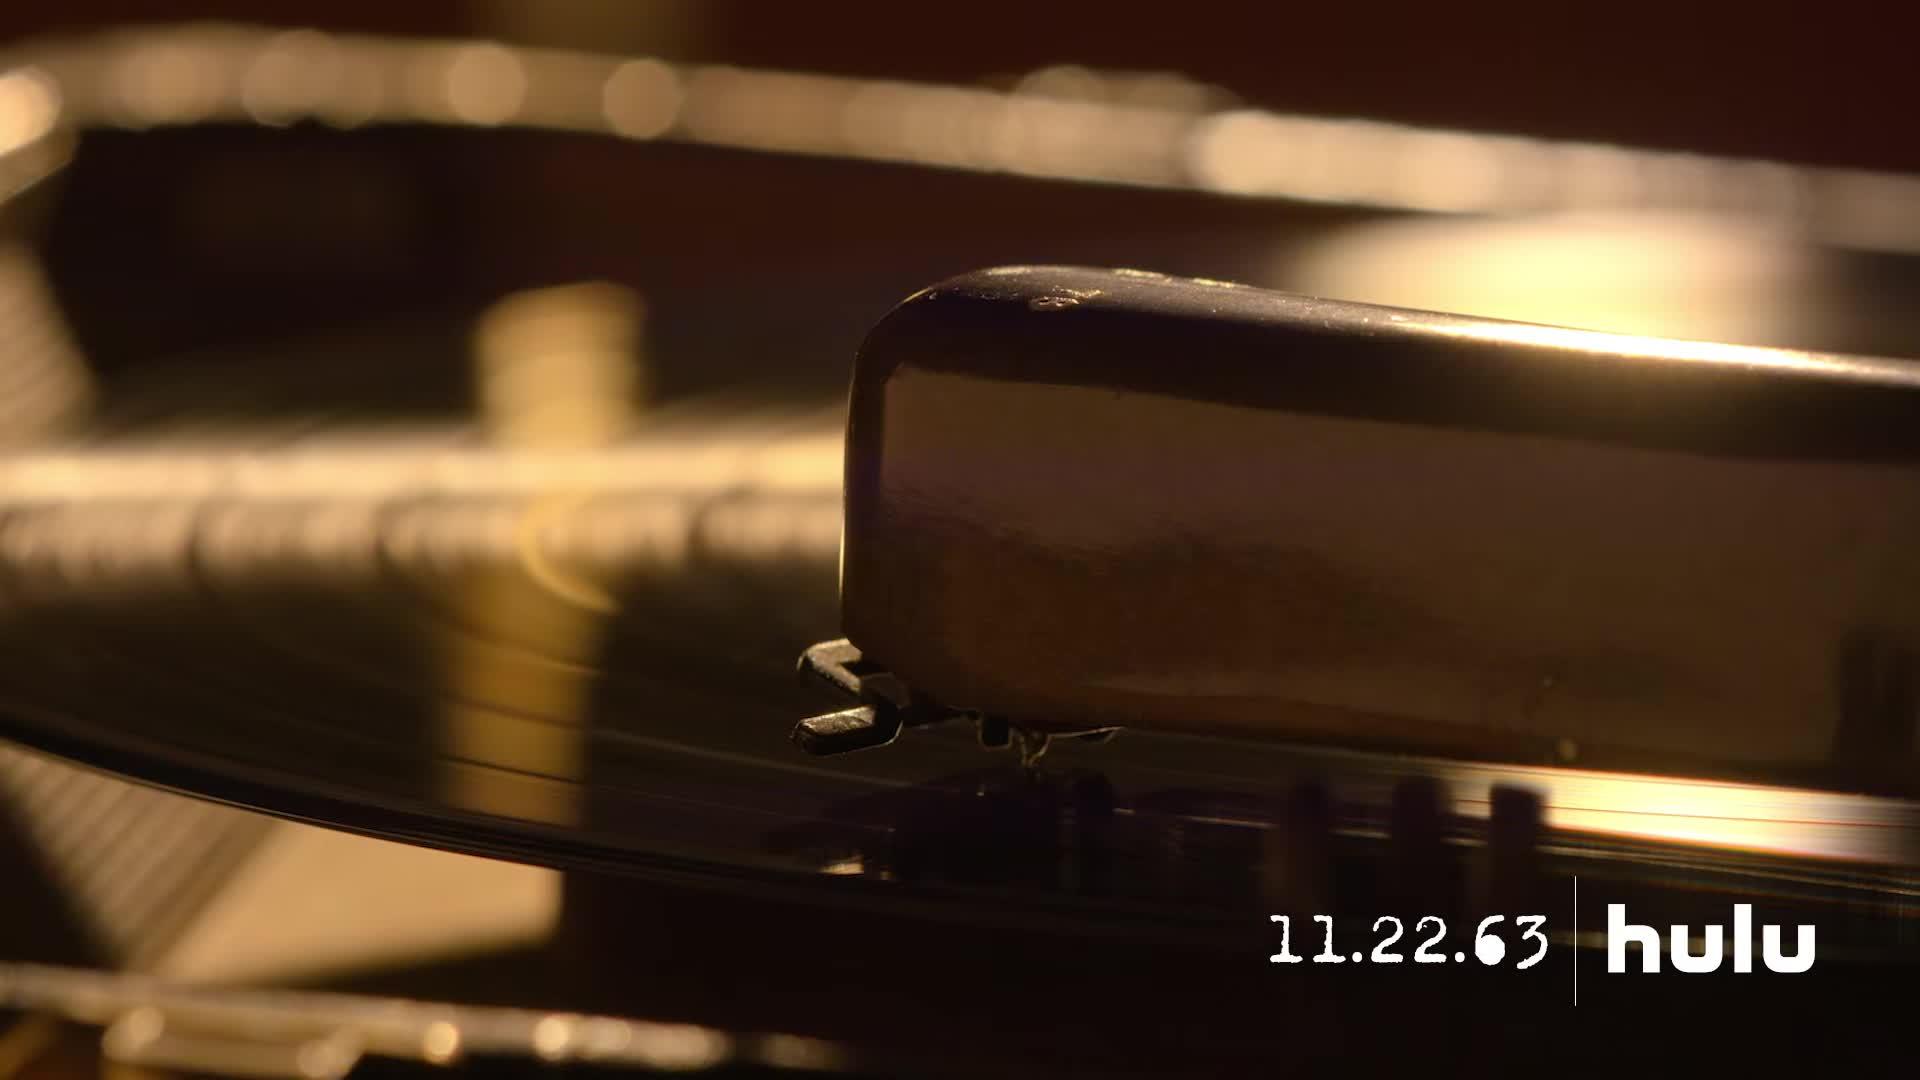 112263, Bridget Carpenter, Bryan Burk, Cherry Jones, Chris Cooper, Daniel Webber, George MacKay, Hulu Original, J.J Abrams, James Franco, John F. Kennedy, Josh Duhamel, Kevin Macdonald, Lee Harvey Oswald, Lucy Fry, Sarah Gadon, Stephen King, Streaming On Hulu, T.R. Knight, hulu, The Best of Jake & Sadie • 11.22.63 on Hulu GIFs